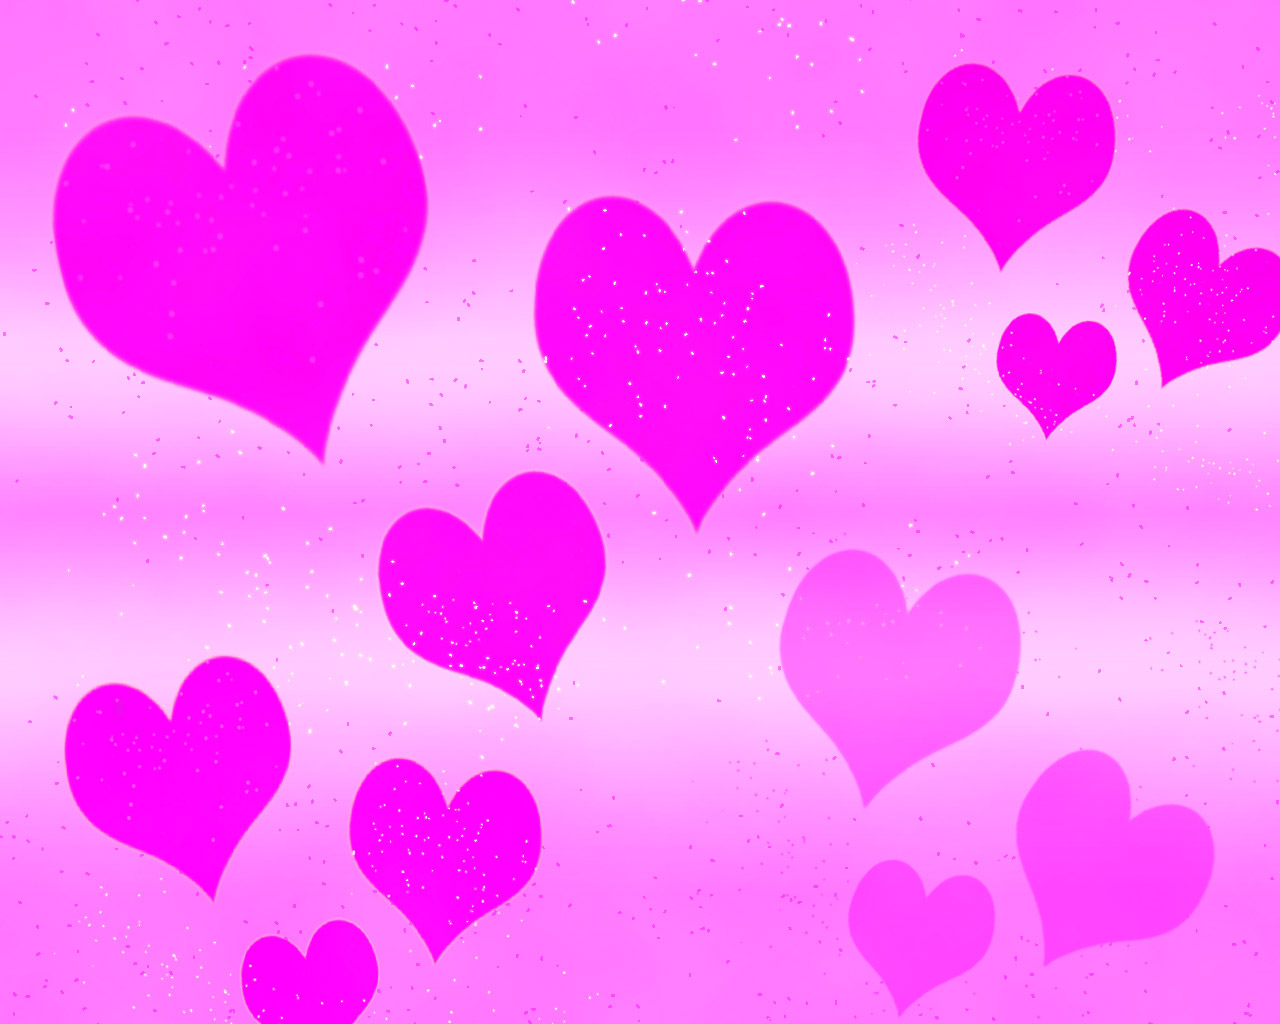 Pink Heart Wallpaper 10058 Hd Wallpapers in Love   Imagescicom 1280x1024